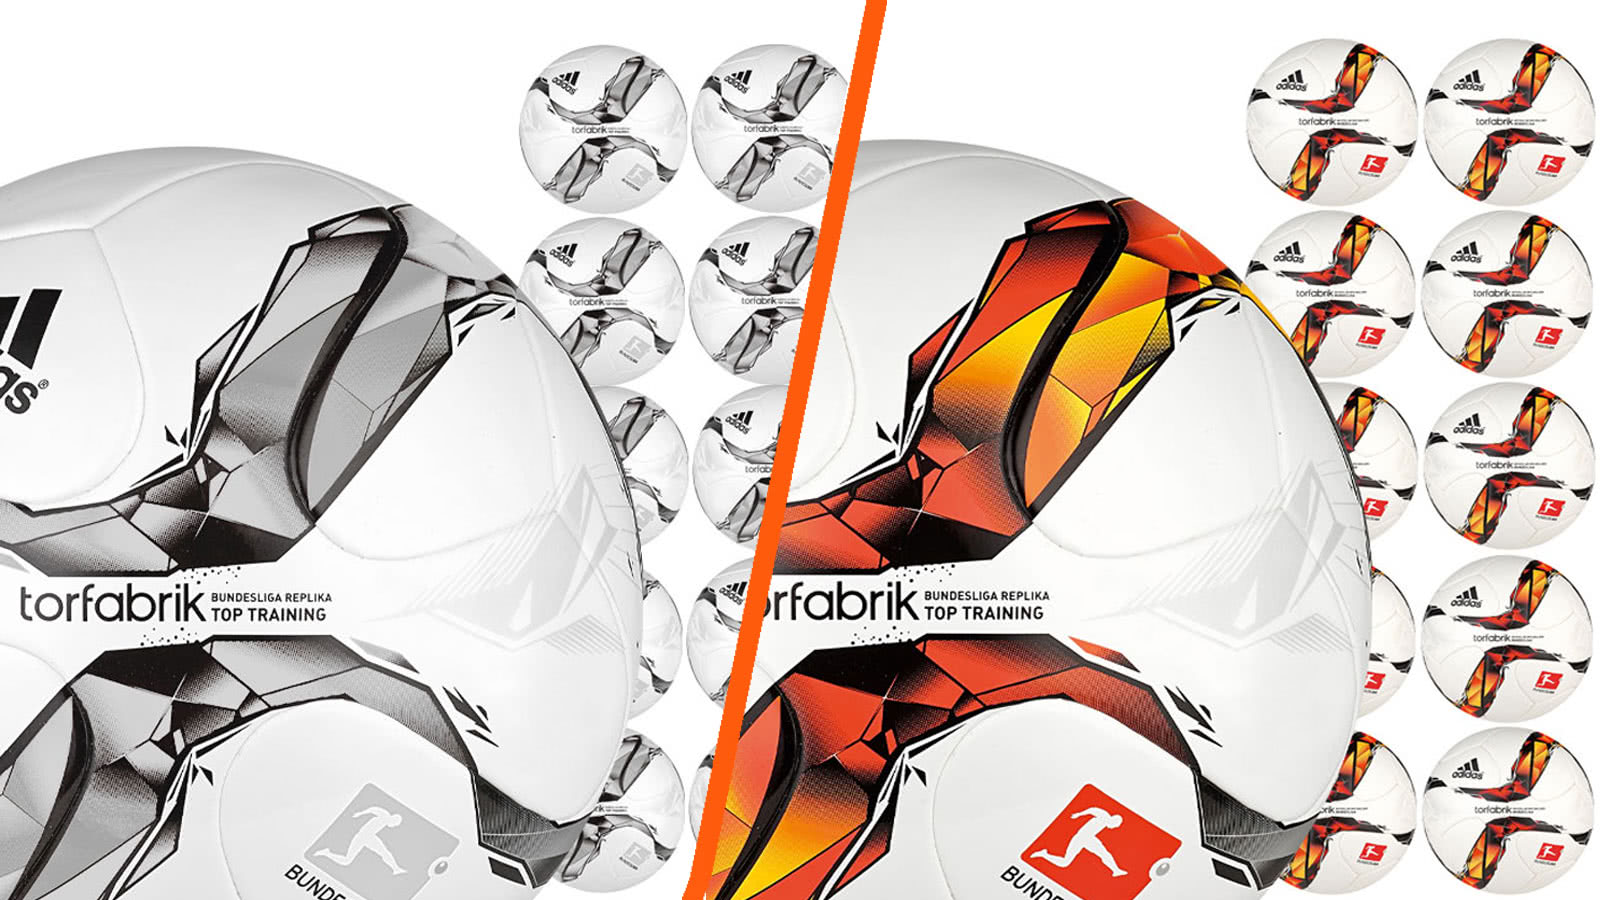 Adidas Trainingsball Torfabrik